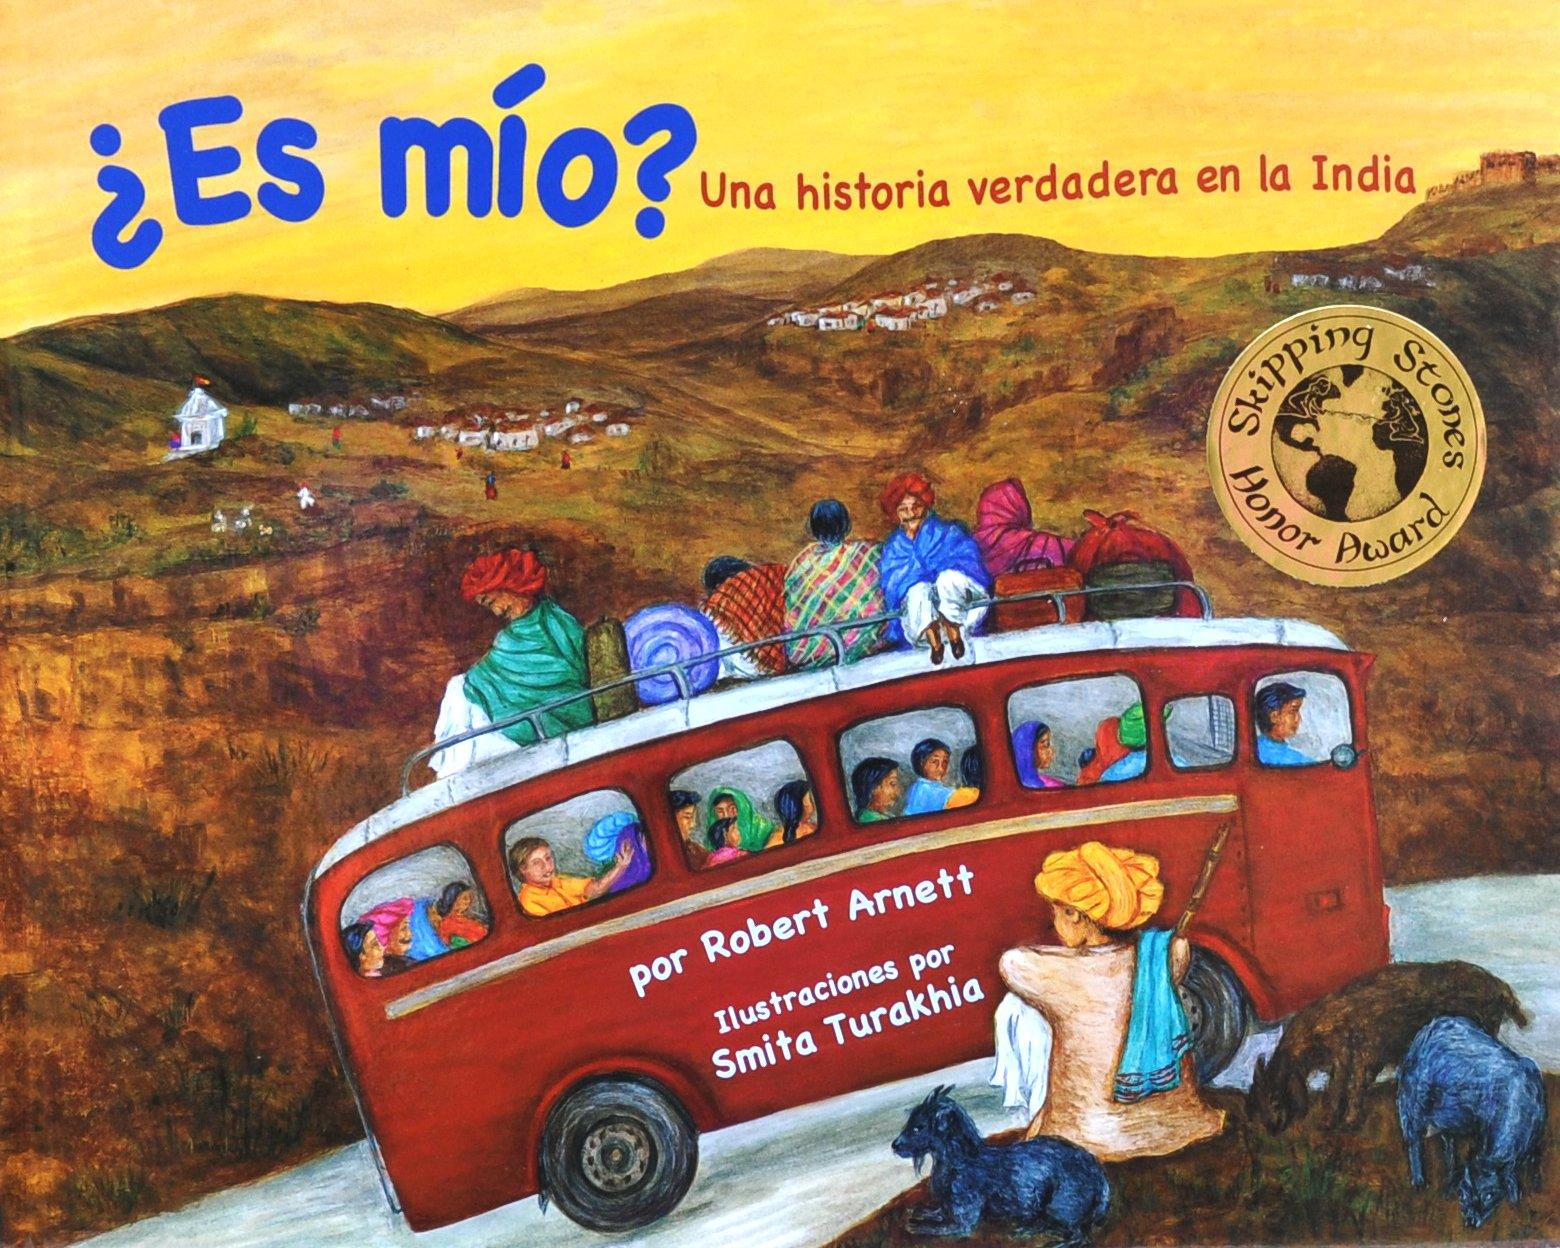 ¿Es mio? Un viaje en autobús en la India (Children's Multicultural and Character Education Book Series) (Spanish Edition) (India Unveiled Childrens Series)